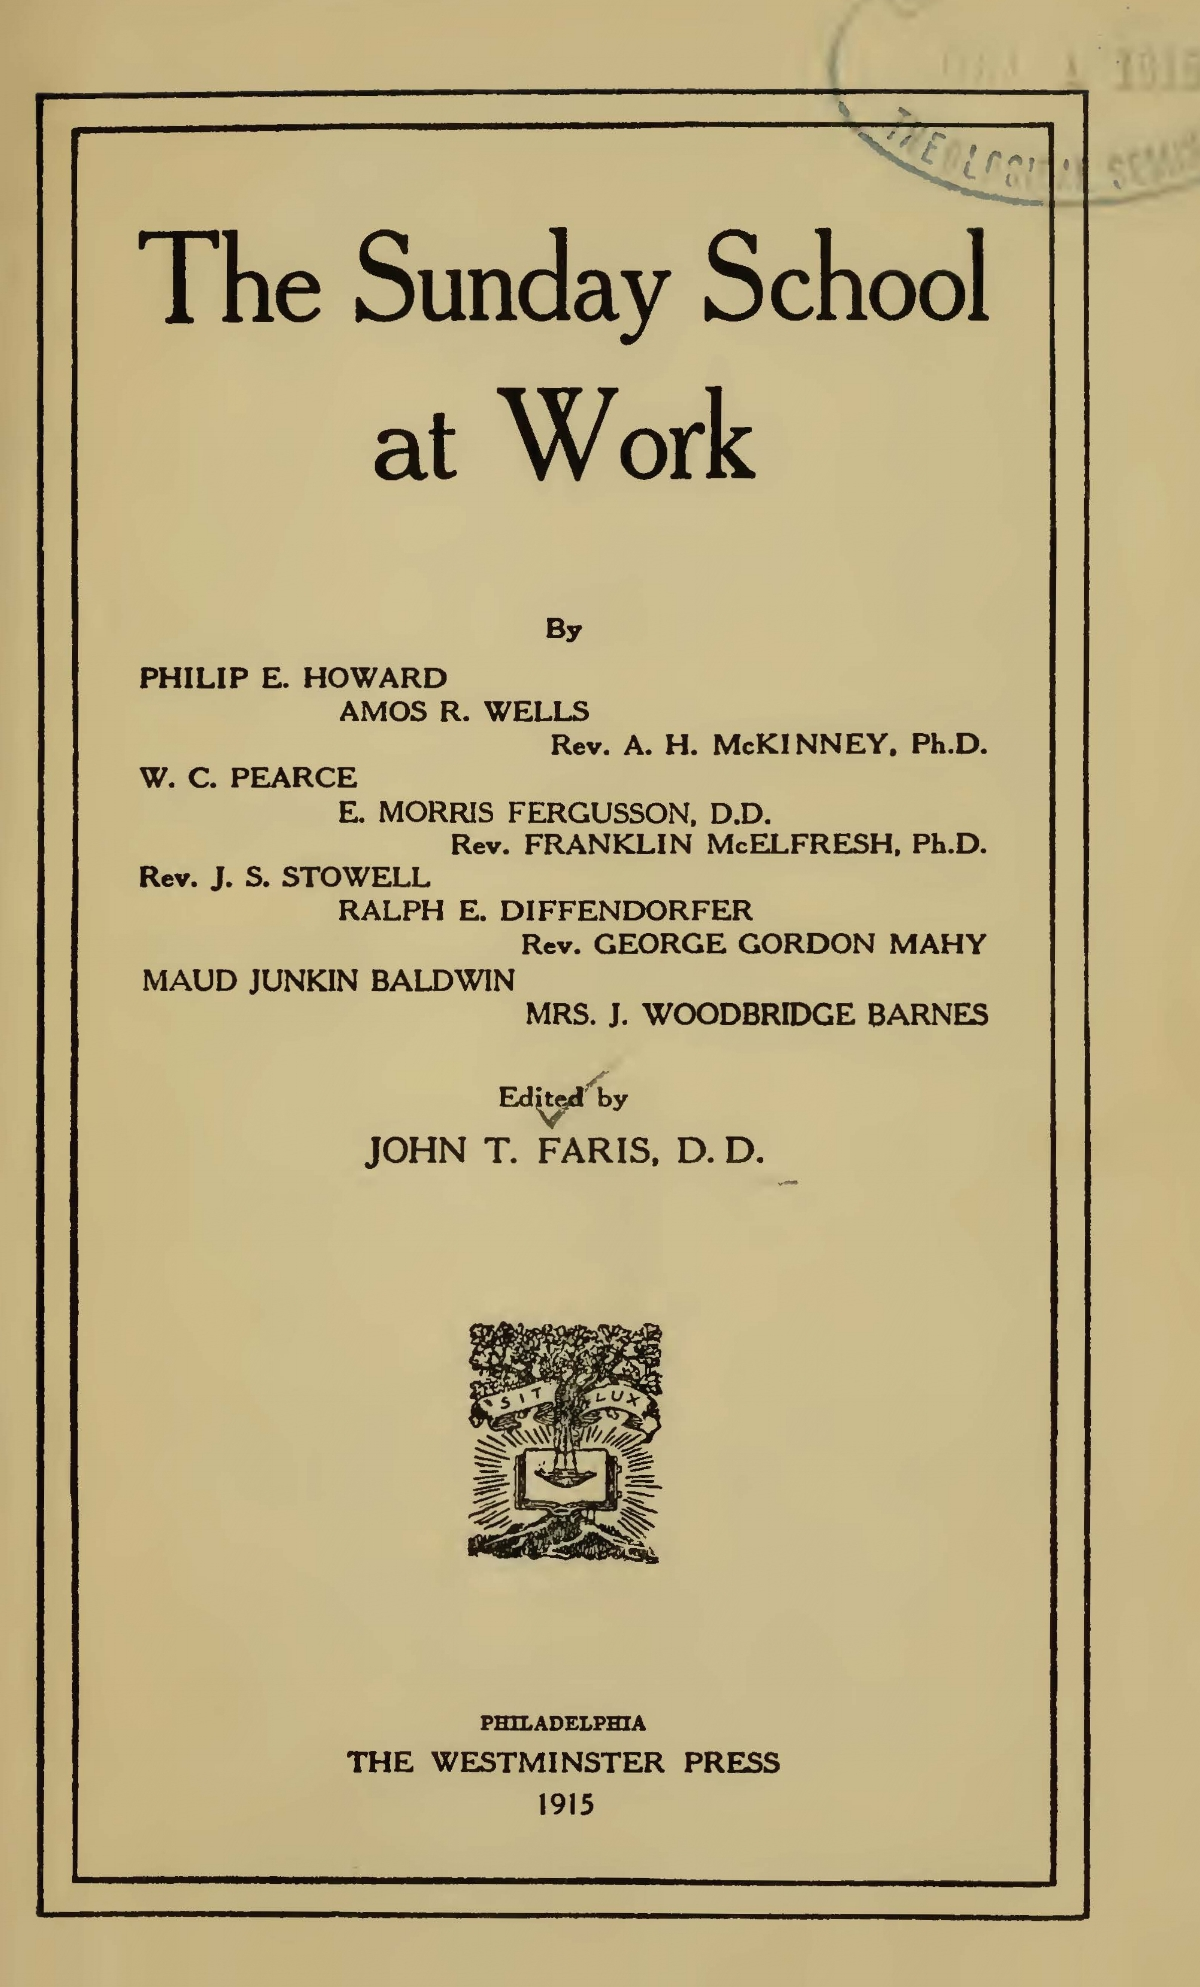 Faris, John Thomson, The Sunday School at Work Title Page.jpg